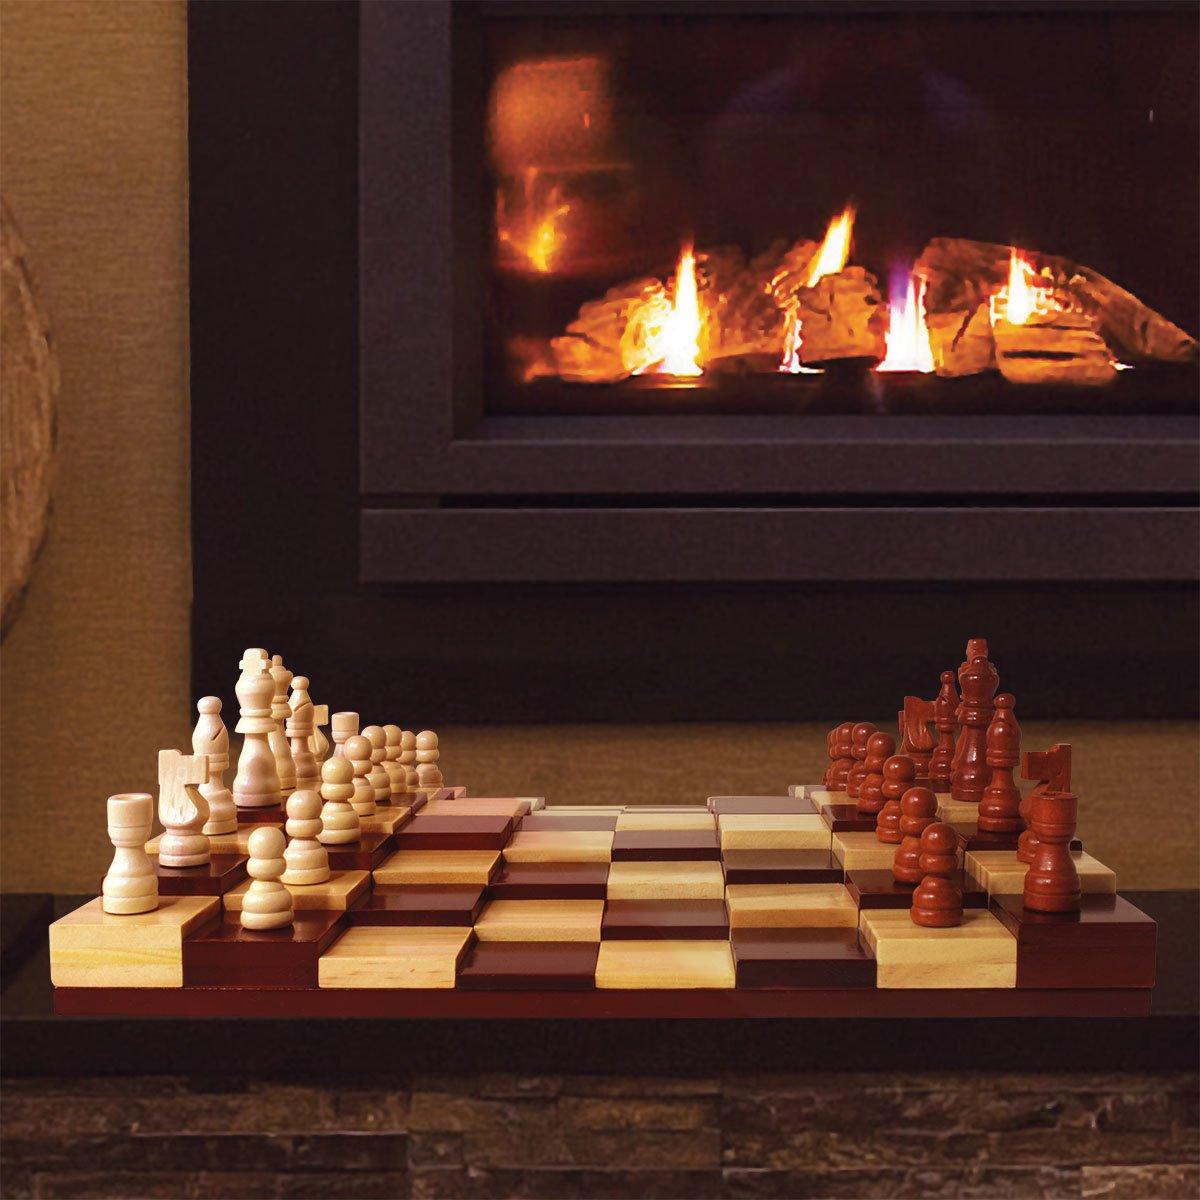 3D Schachbrett 32 Schachfiguren Multi-Level Holz Schachspiel Set Deluxe Brettspiel Blu Devil